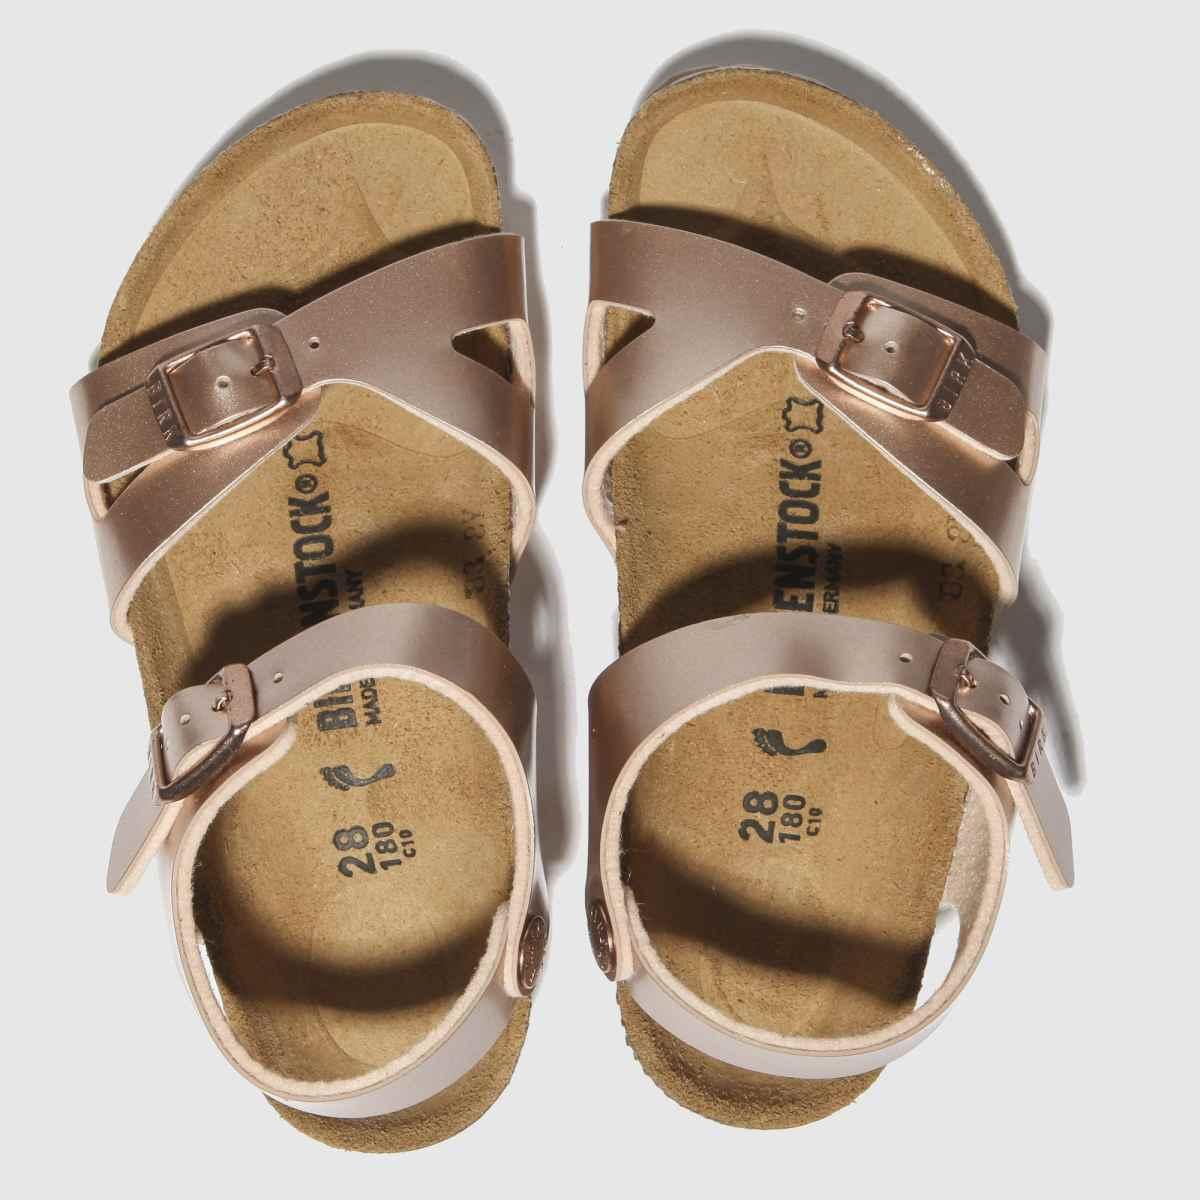 Birkenstock Bronze Rio Sandals Toddler